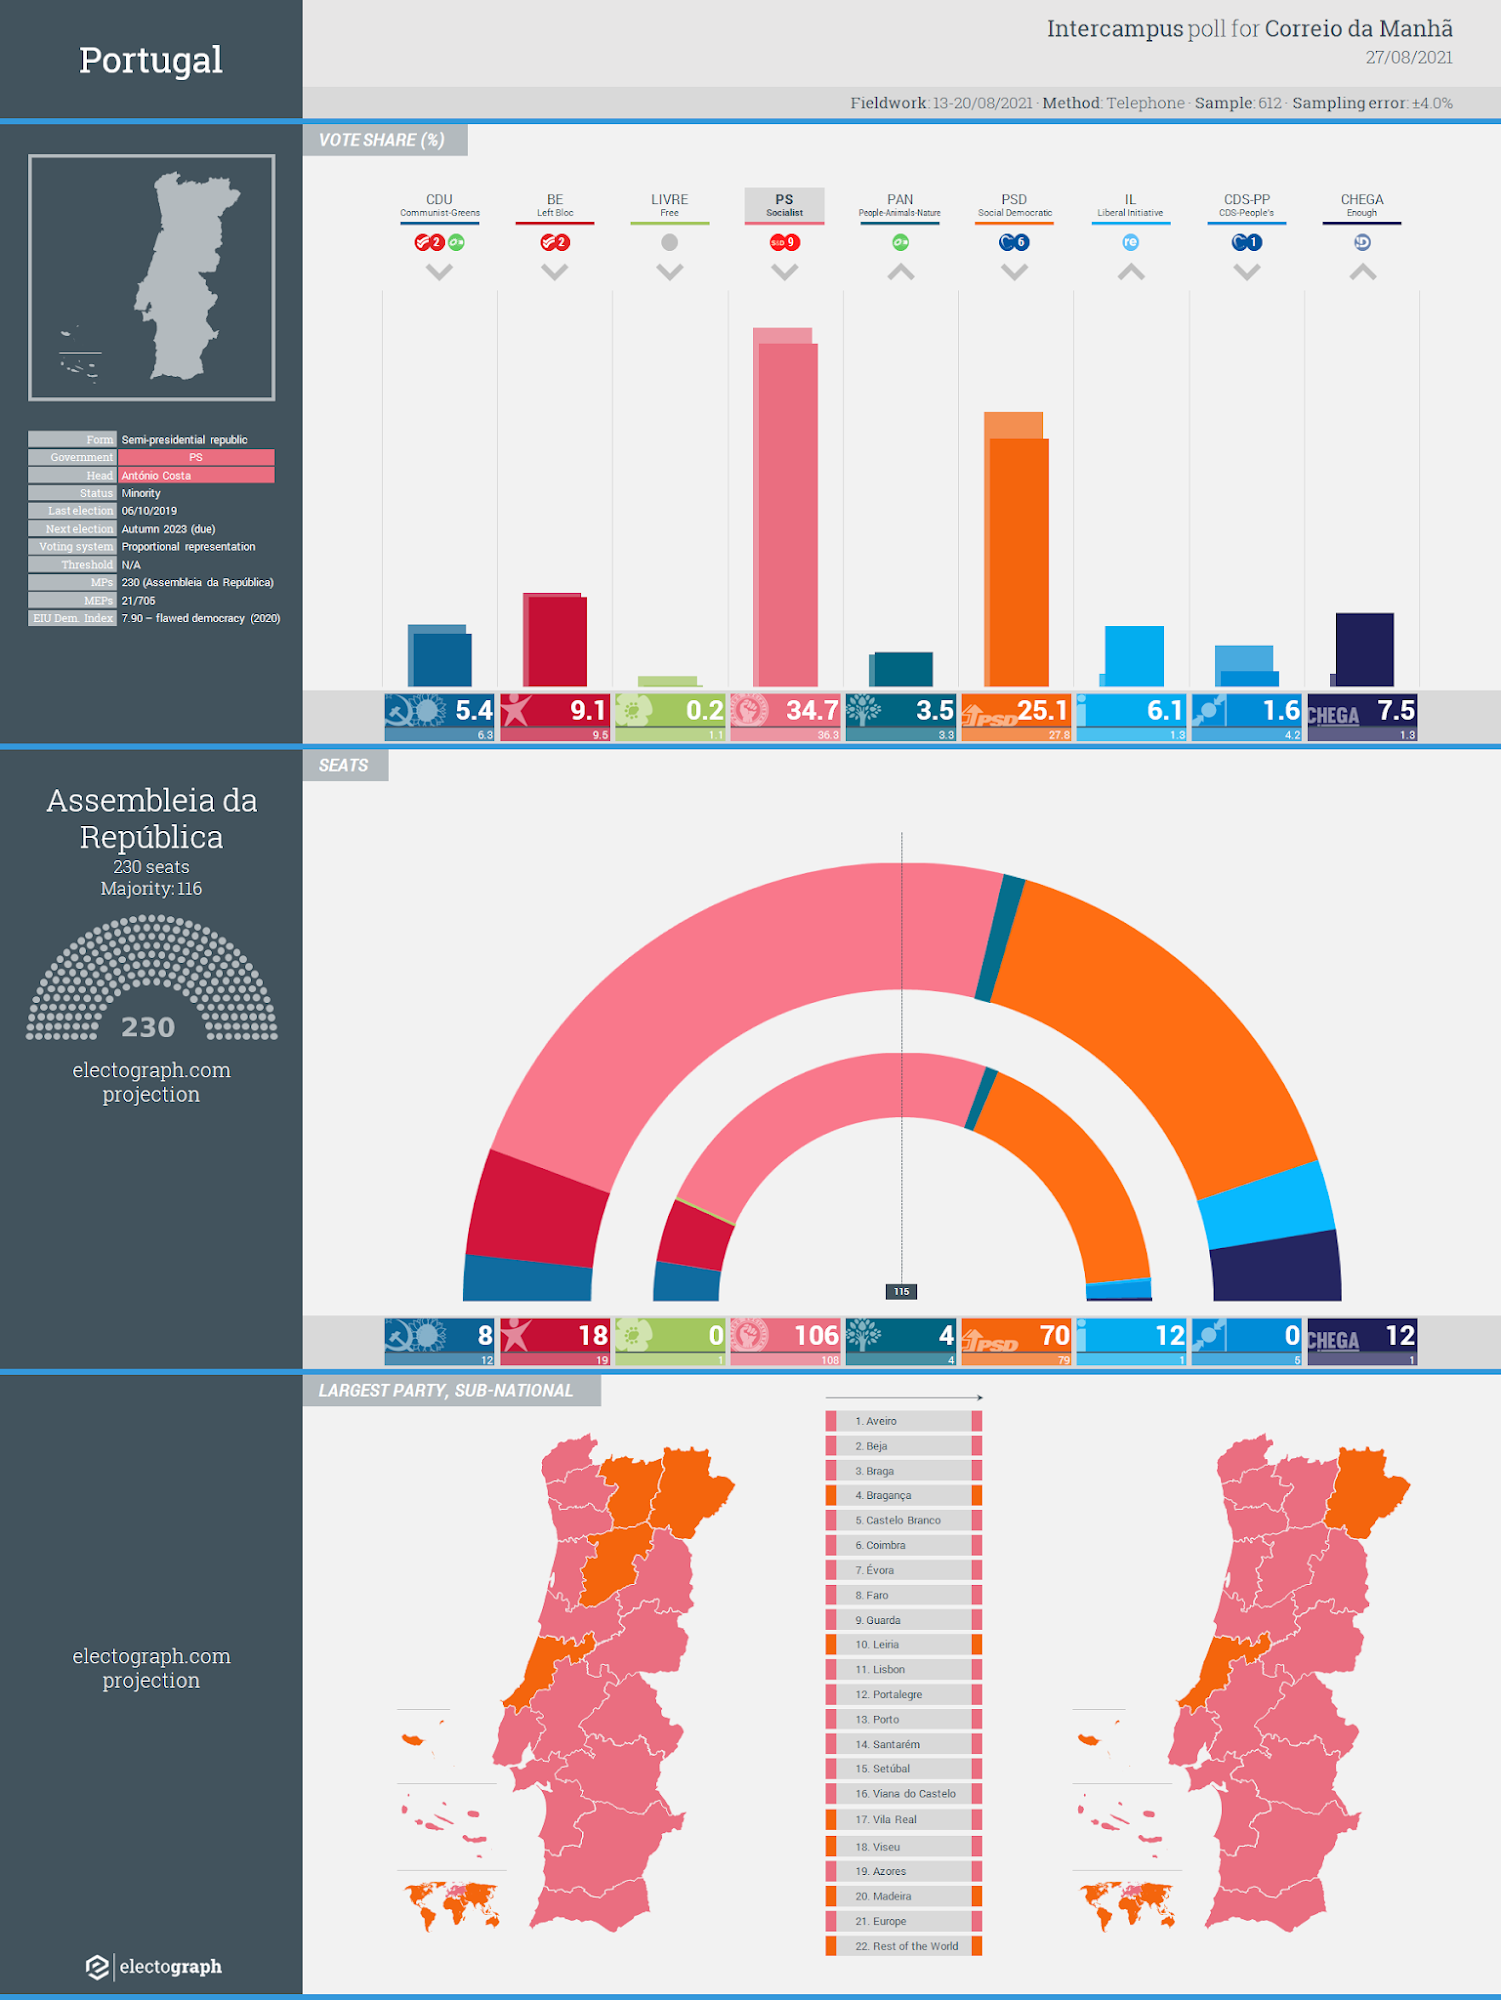 PORTUGAL: Intercampus poll chart for Correio da Manhã and Negócios, 27 August 2021